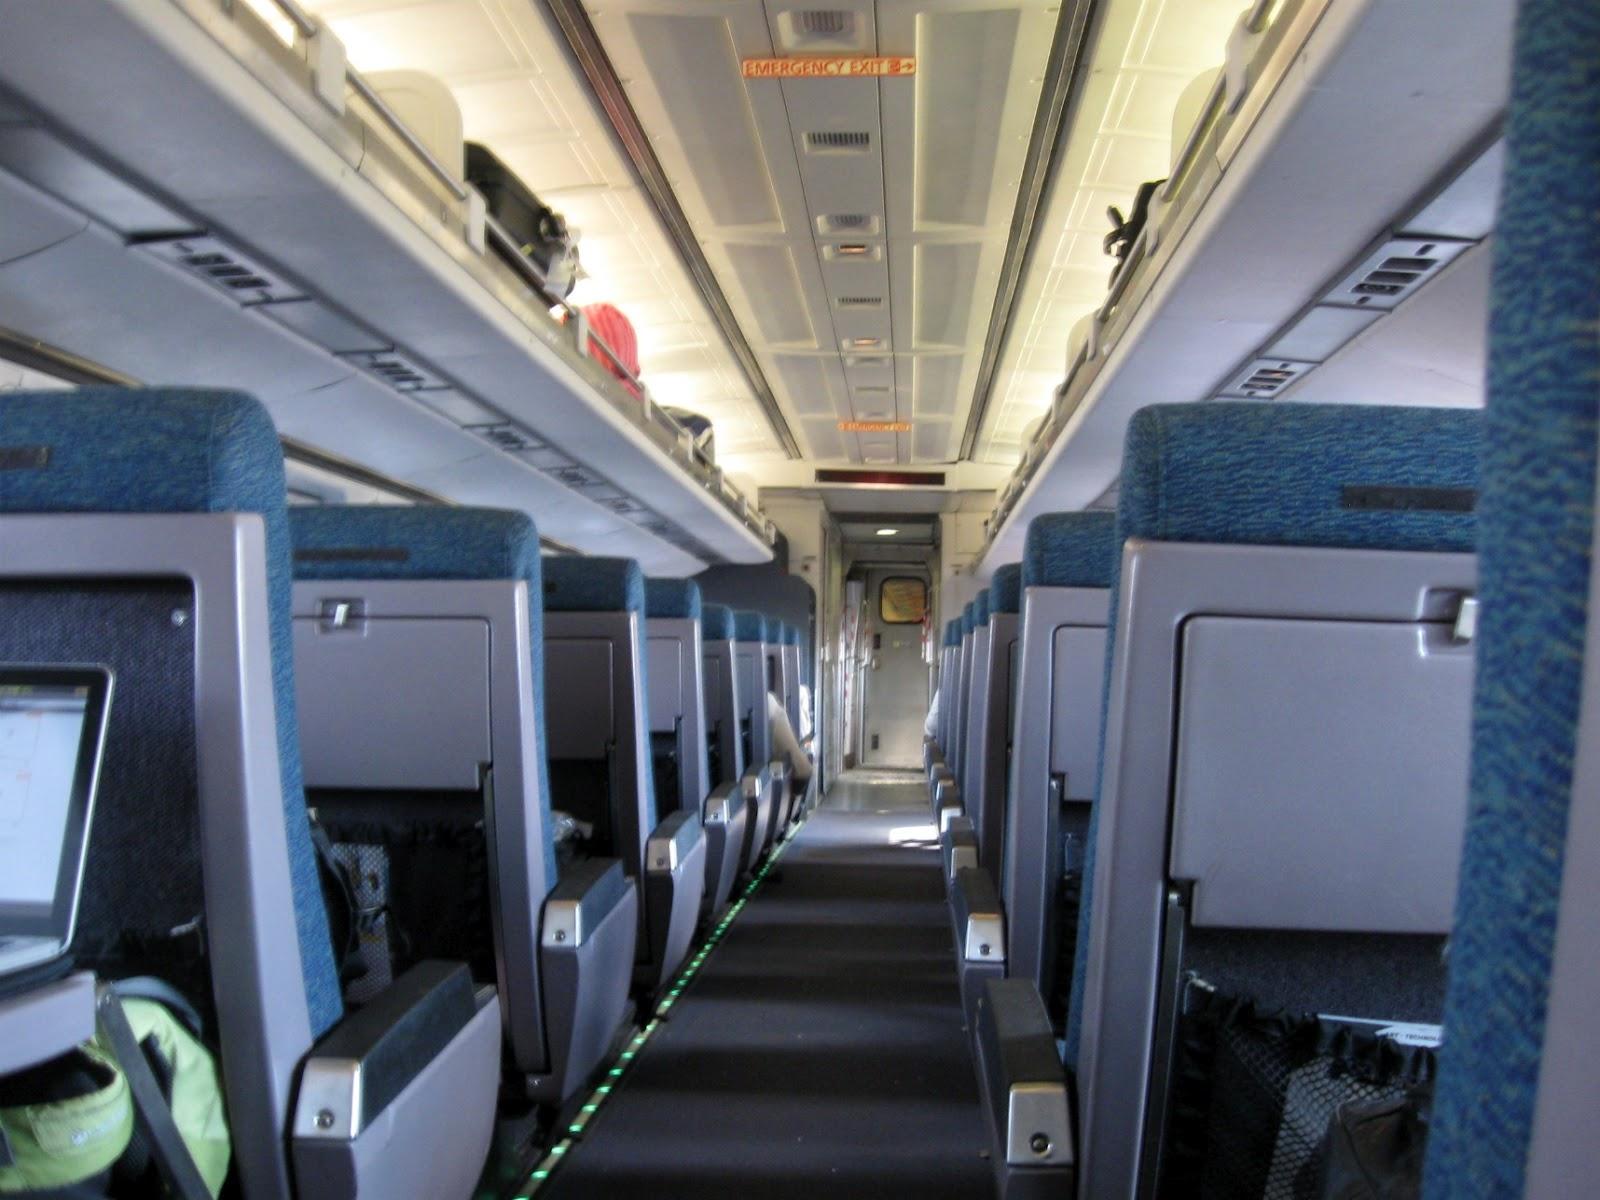 Pictures Inside Amtrak Train Fetish Fantasy Bondage